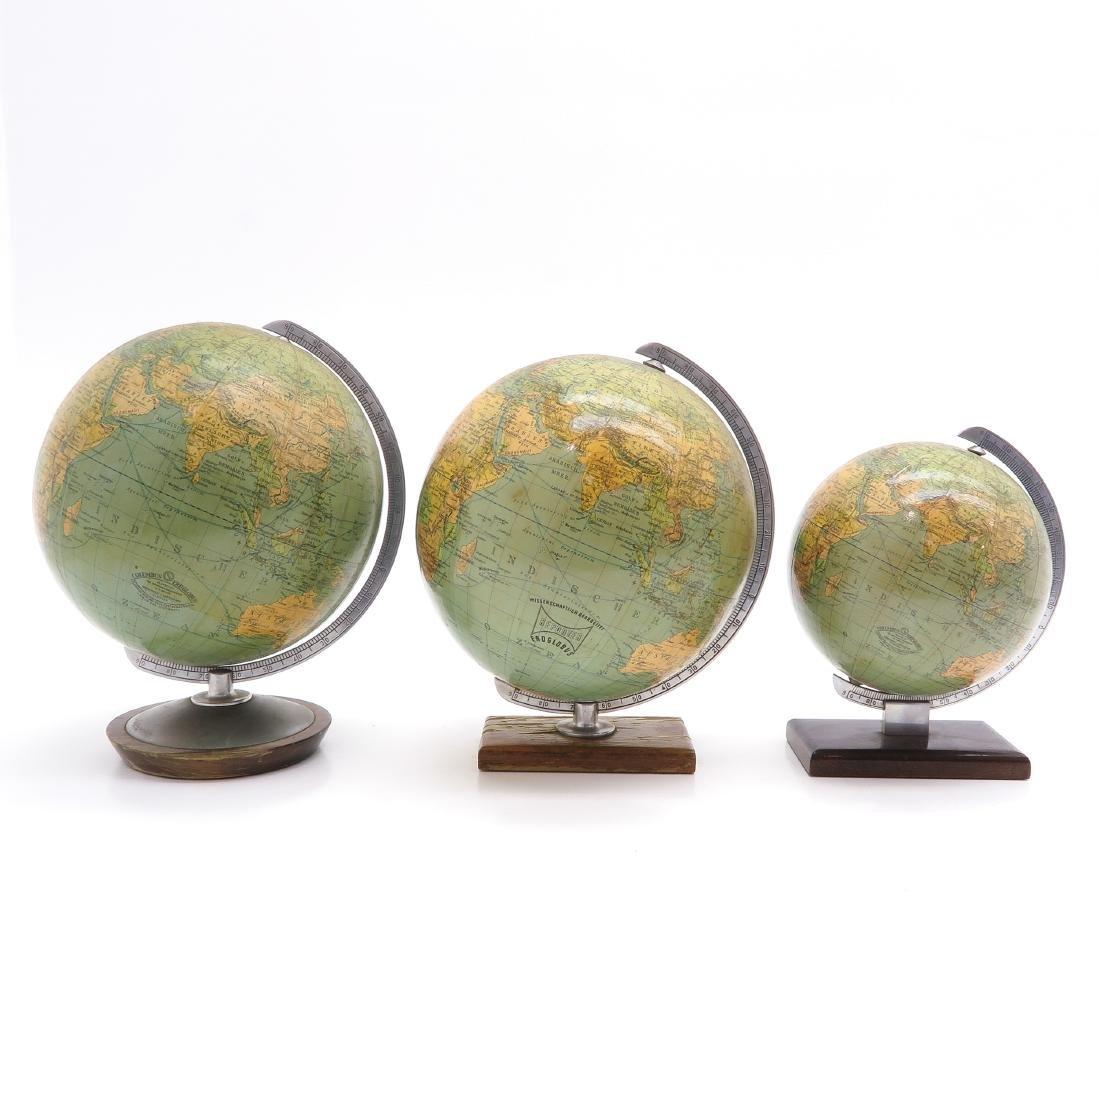 A Lot of 3 Columbus Erdglobus Globes